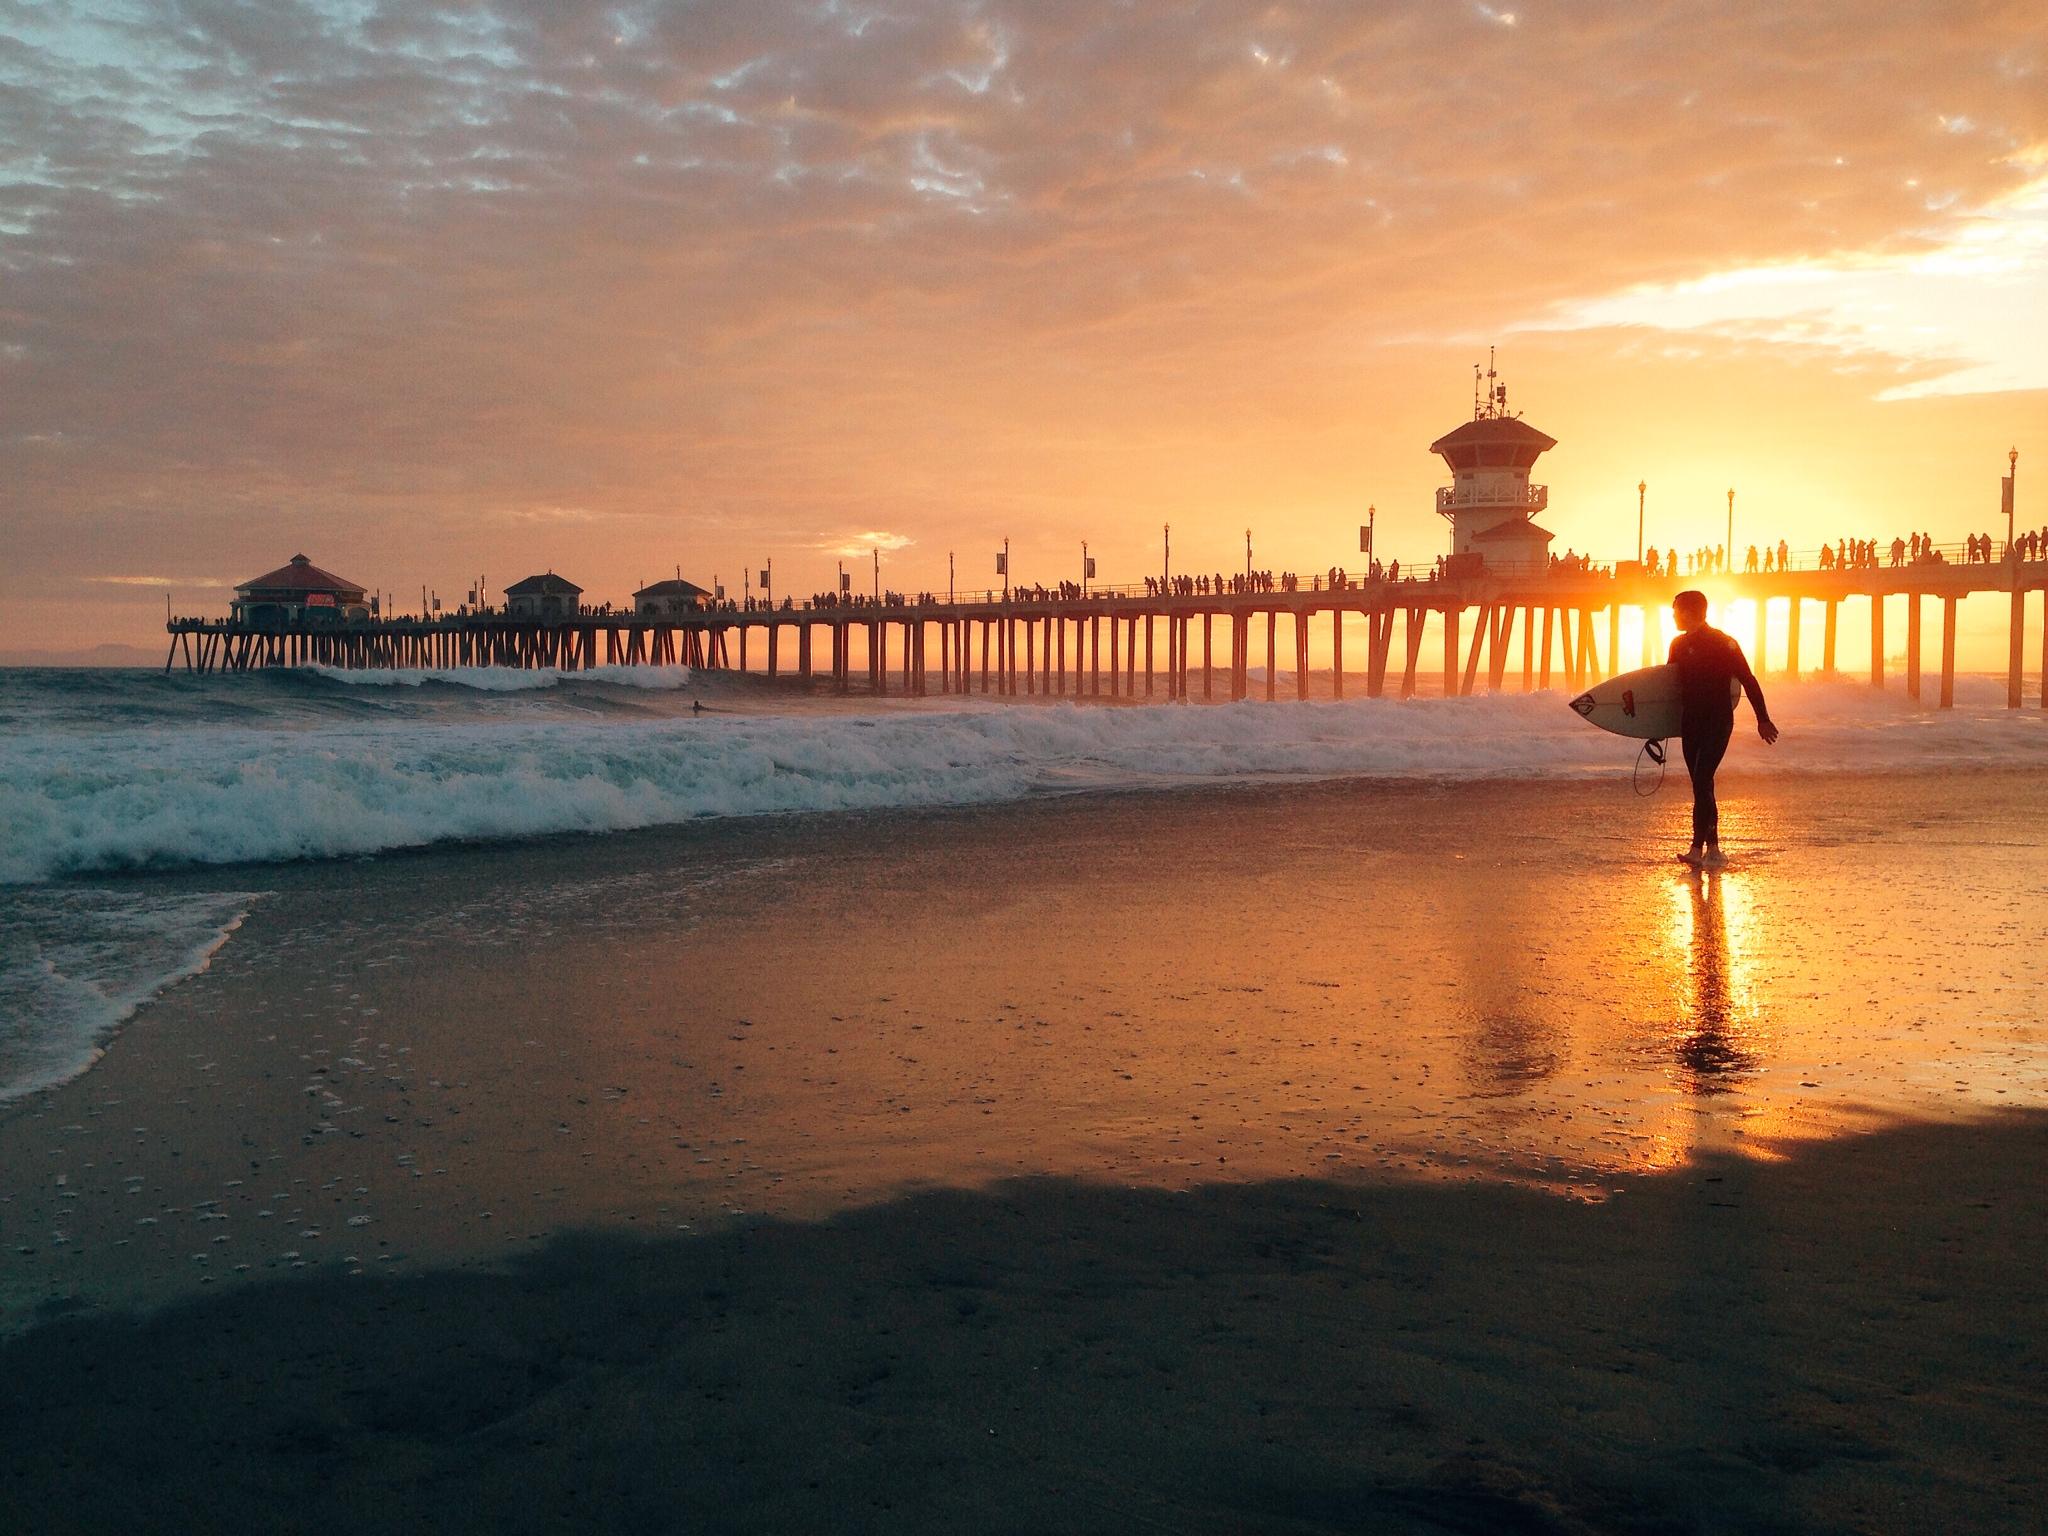 at Huntington Beach Pier - Bells Beach, United States